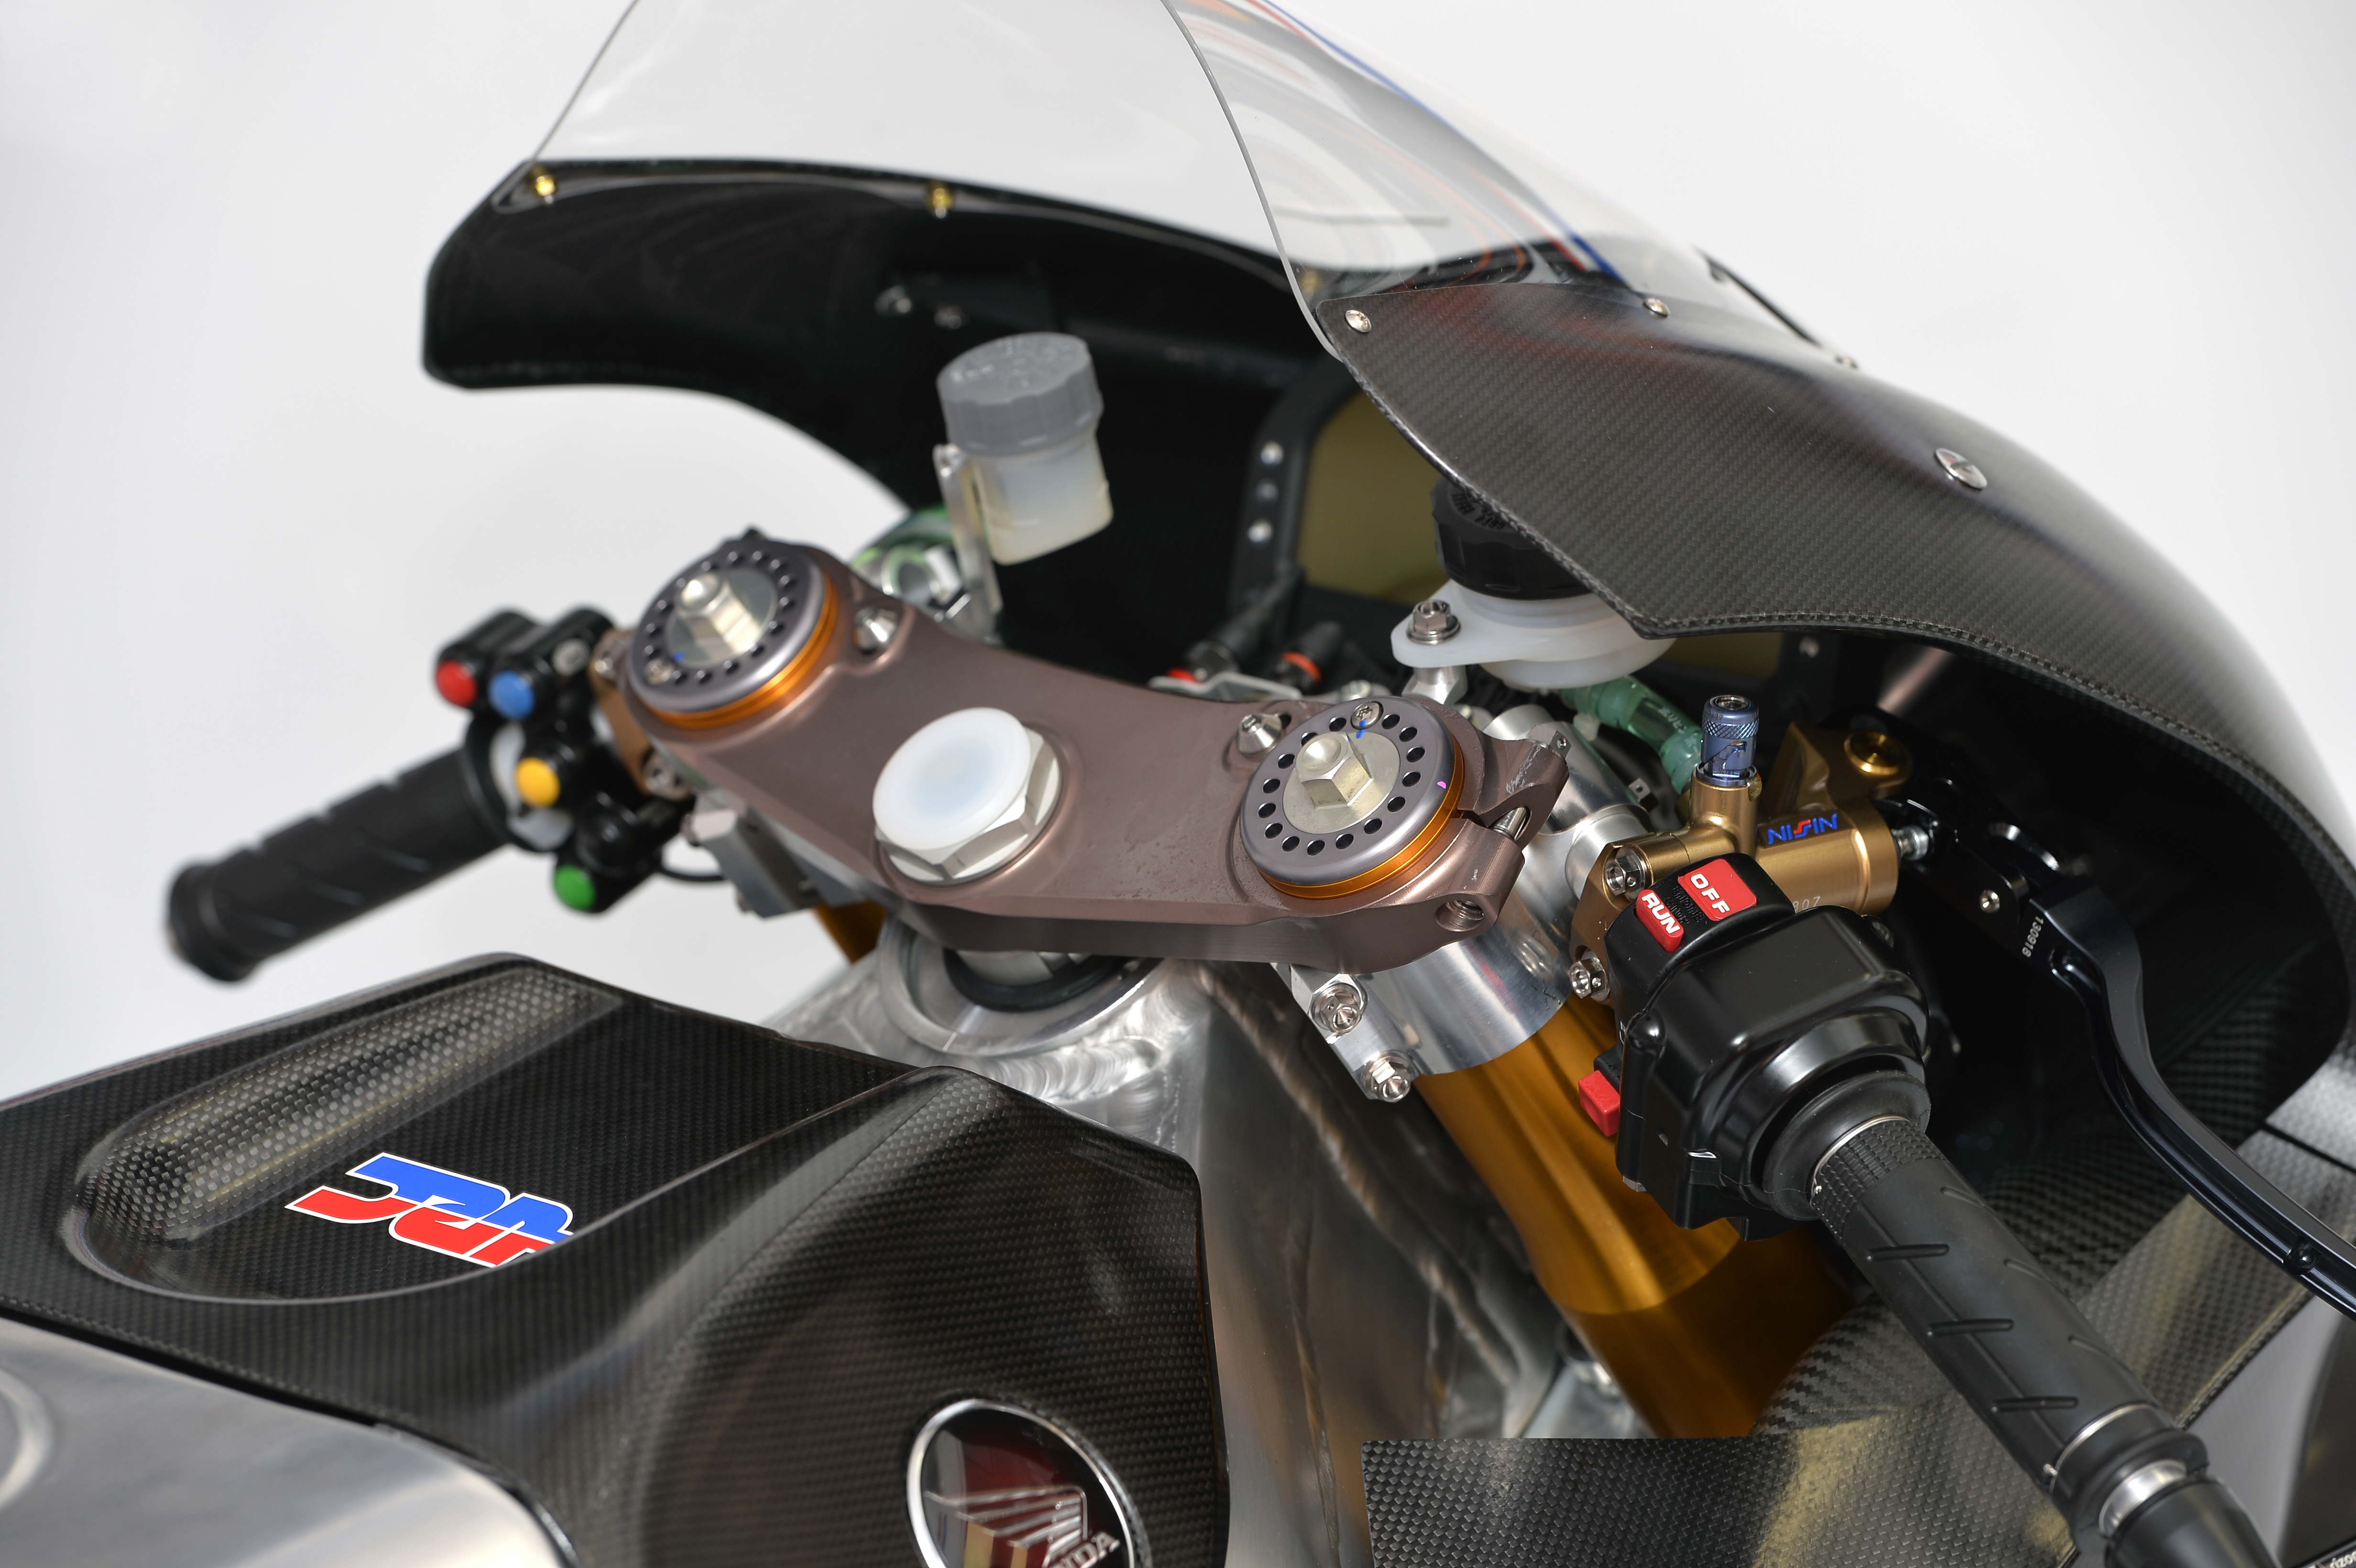 honda_rcv1000r_motogp_production_racer_www_racemoto_com_020